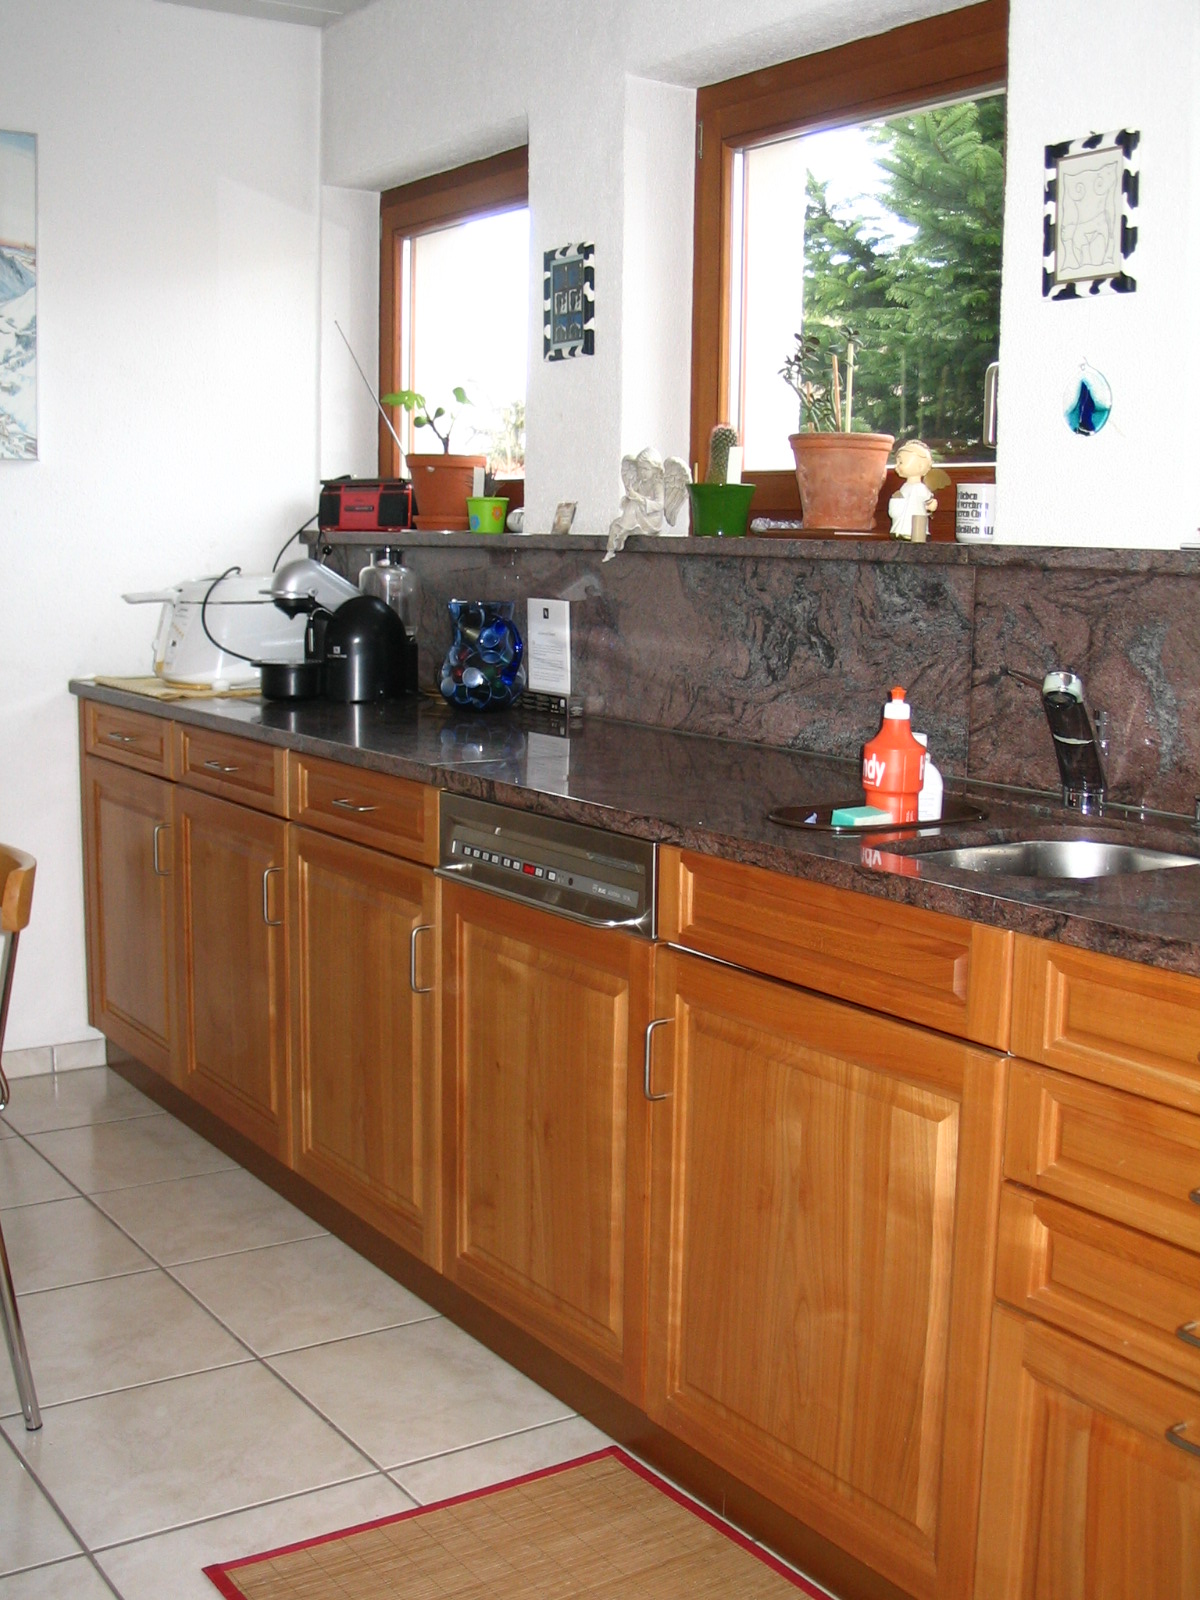 Best Nolte Küchen Schubladeneinsatz Images - Milbank.us - milbank.us